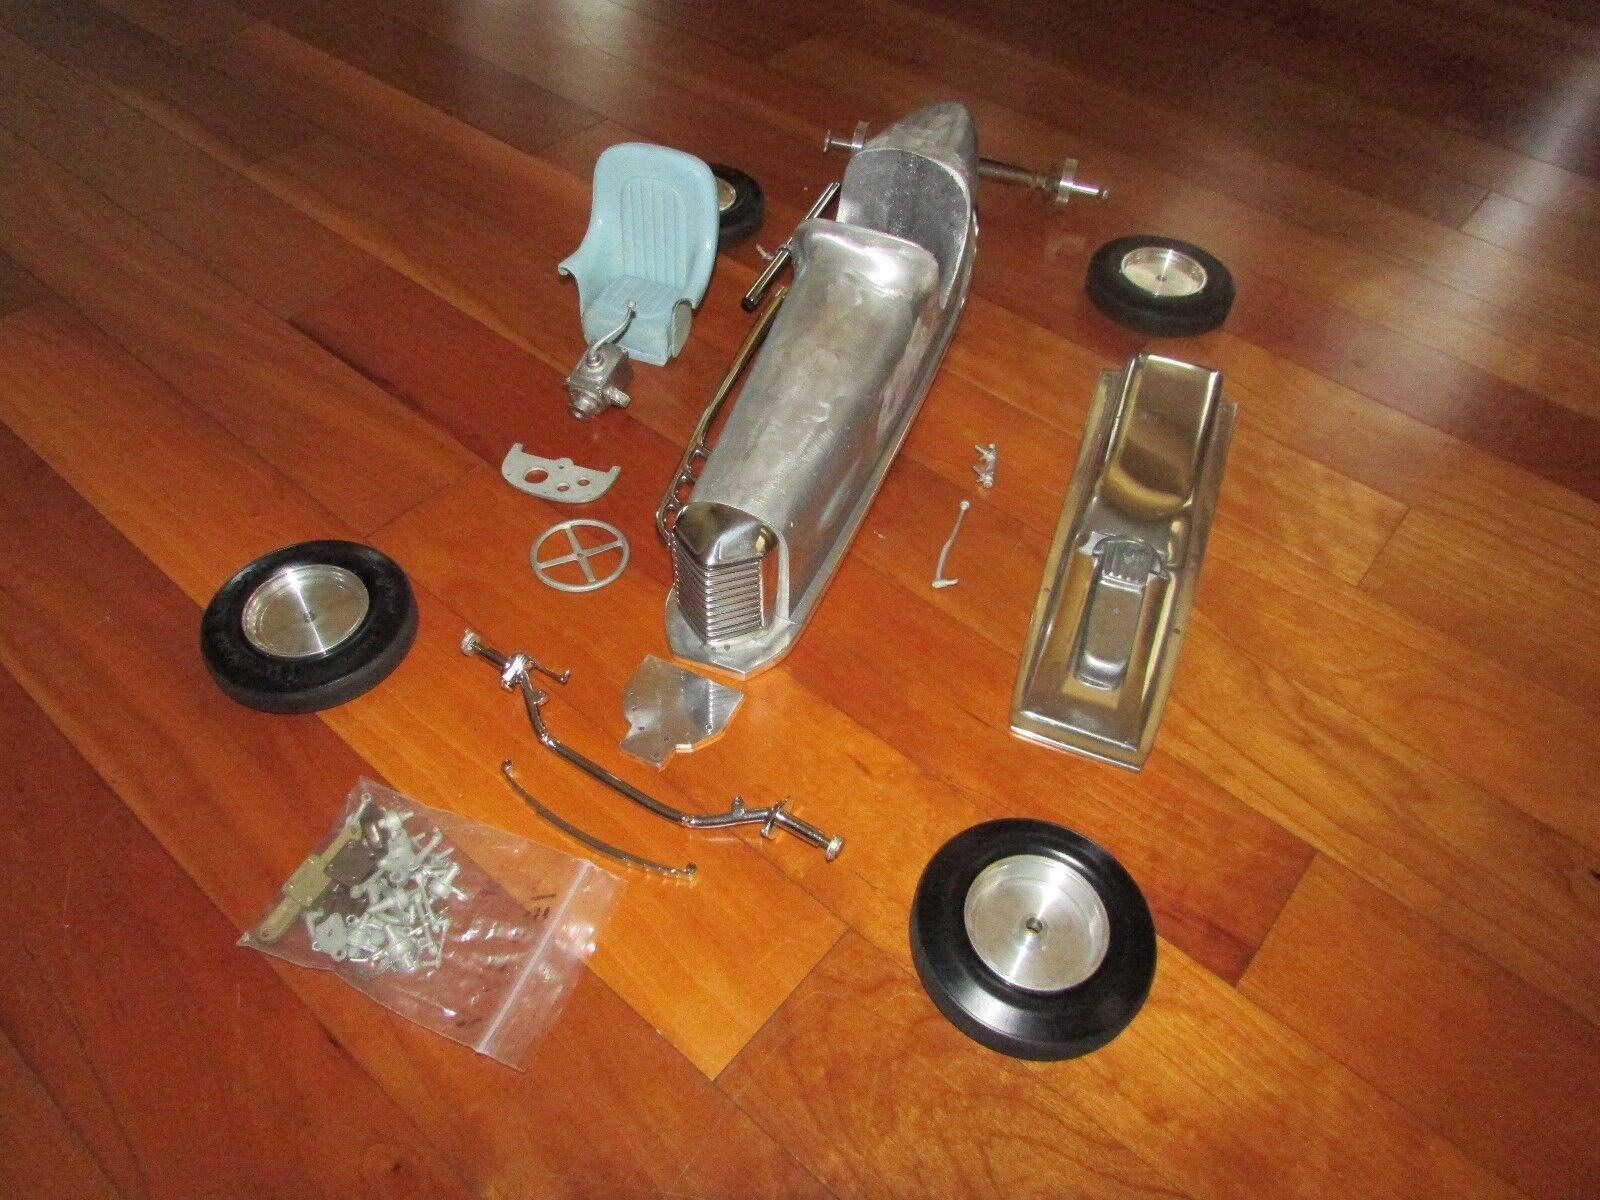 Década de 1930 Indy 500 Miller Race Coche Kit de piezas de calidad construido a medida 18  de aluminio fundido